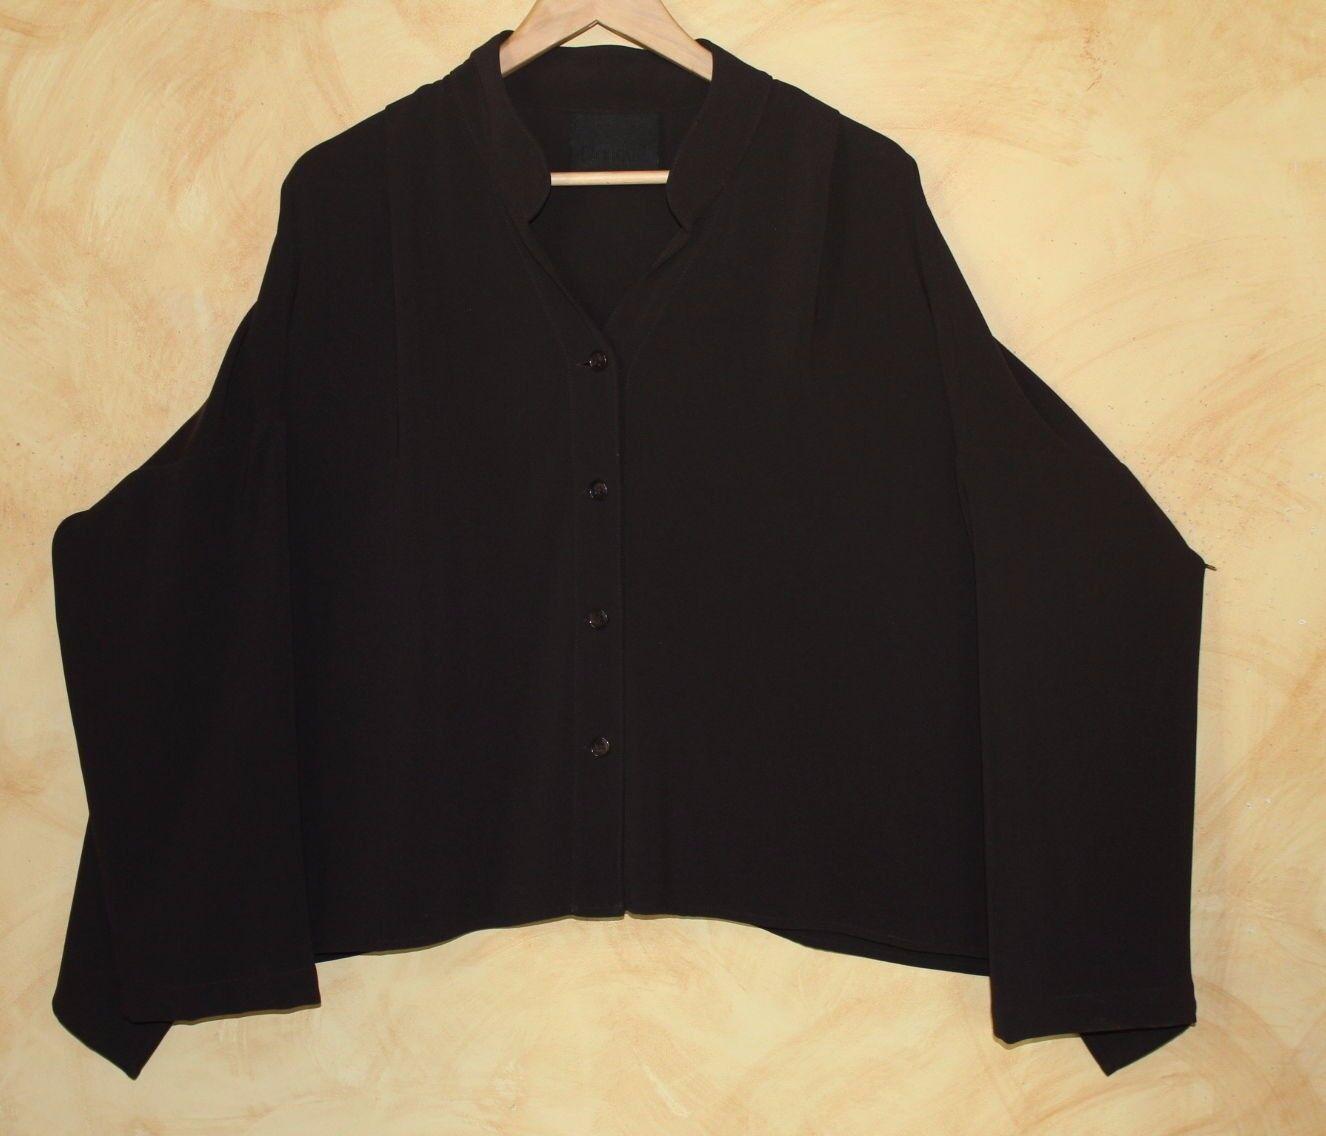 BLANQUE Cocoa braun Sculptural Flowing Art-to-Wear Lagenlook Shirt Jacket 1 O S